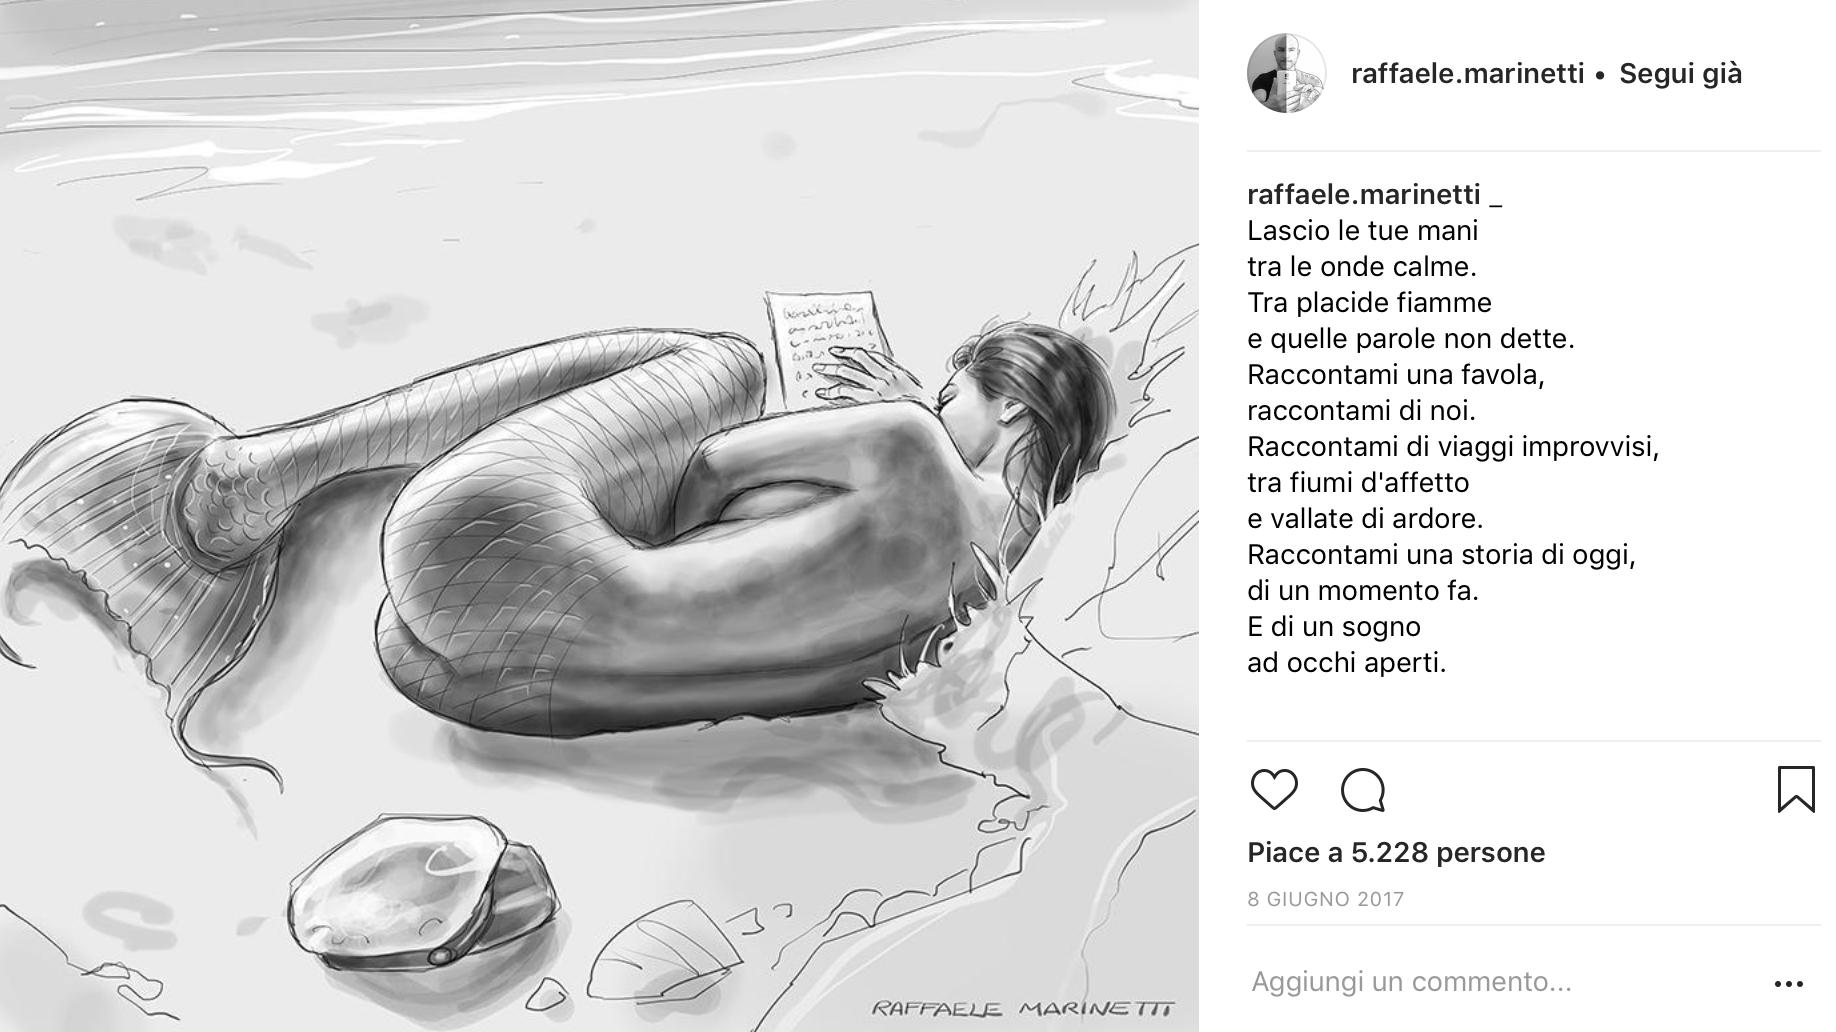 Raffaele Marinetti - sirena-1